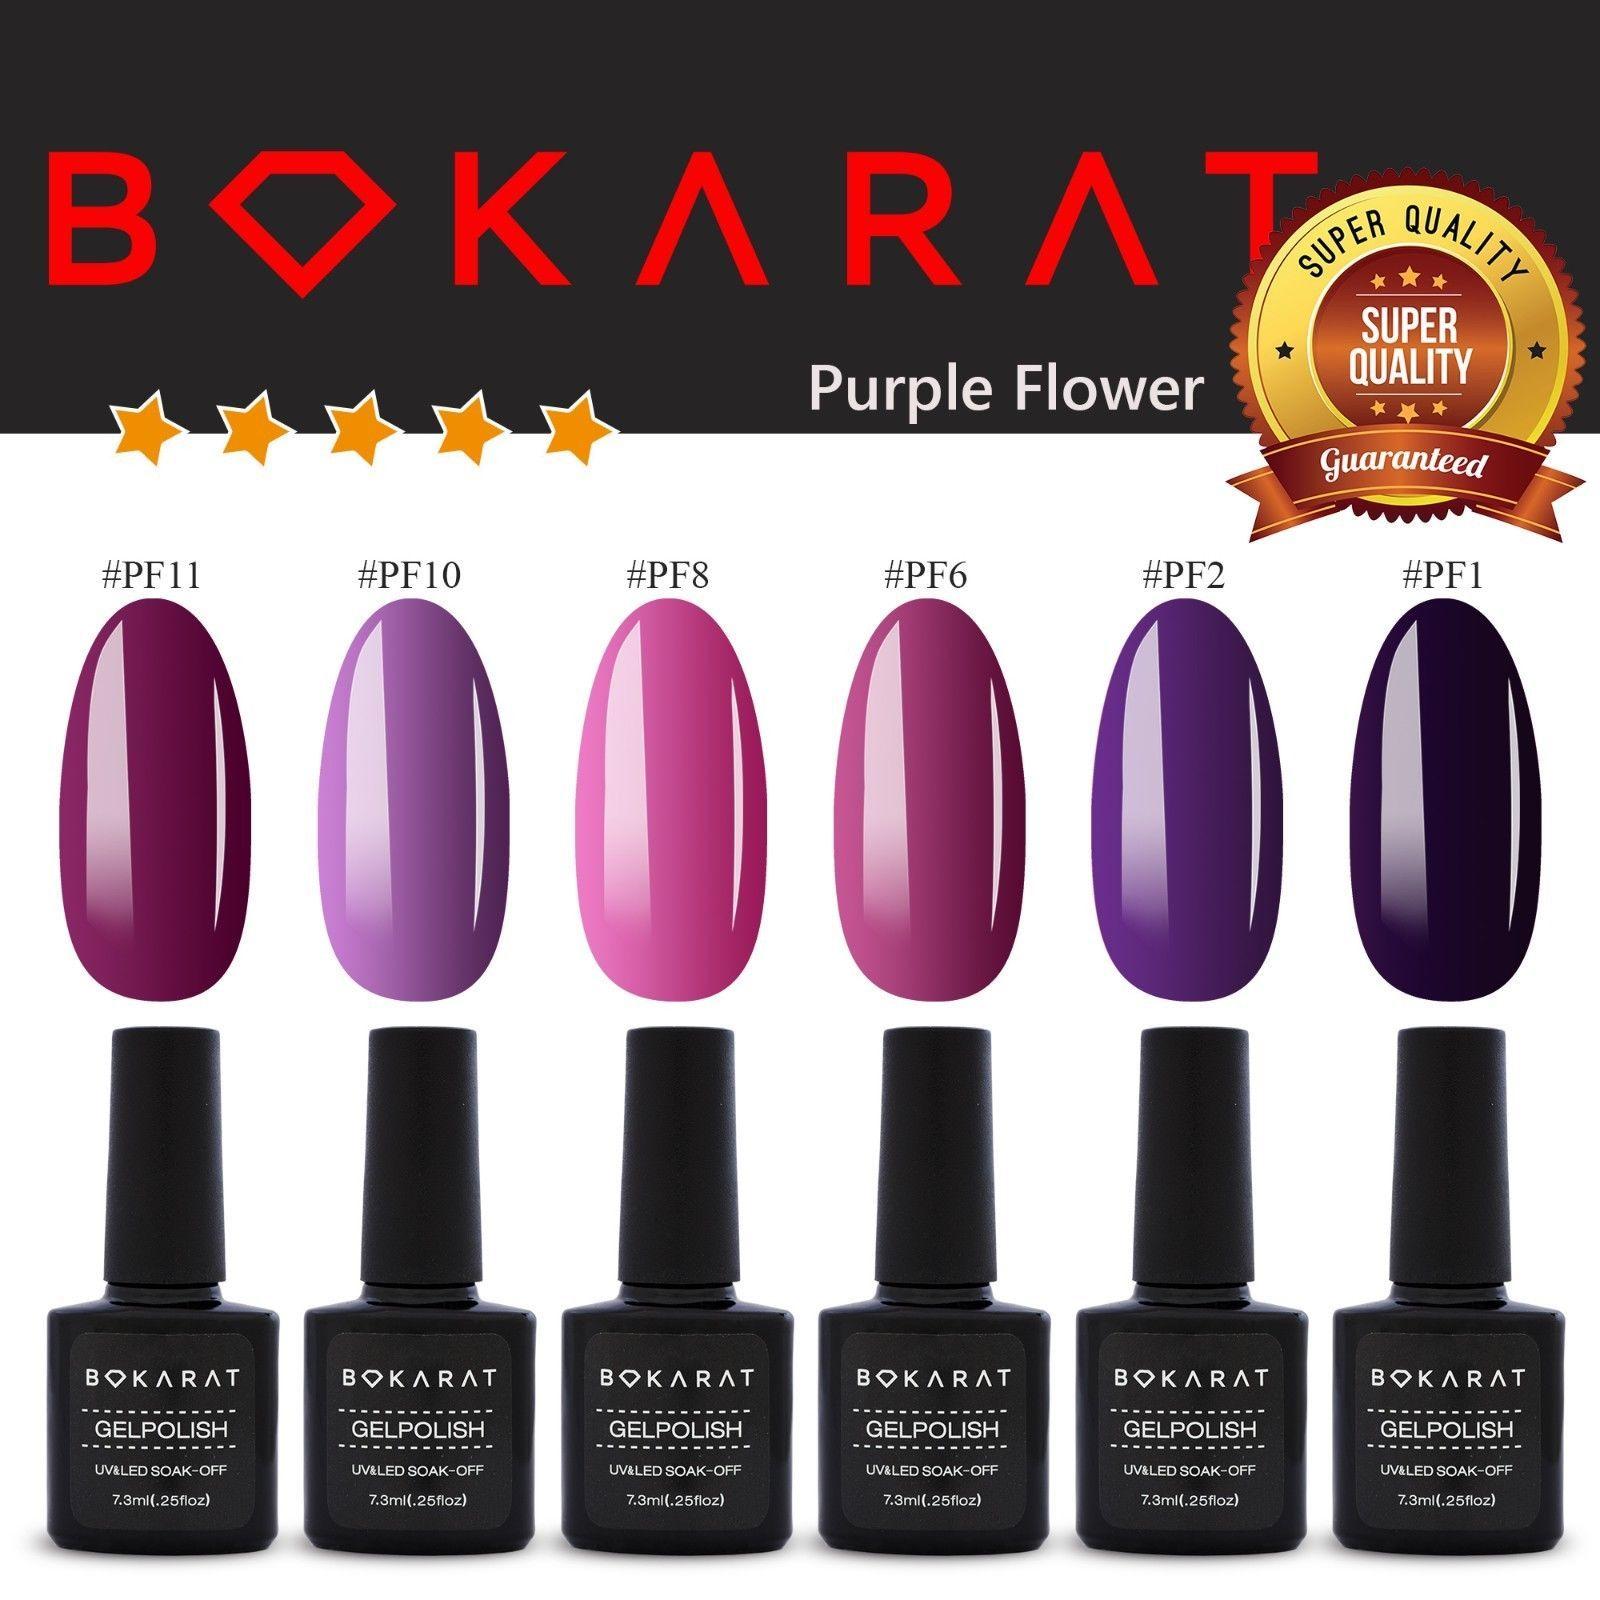 Purple Flower Color Bokarat Gel Nail Polish 7.3 ml Soak Off UV LED High Quality